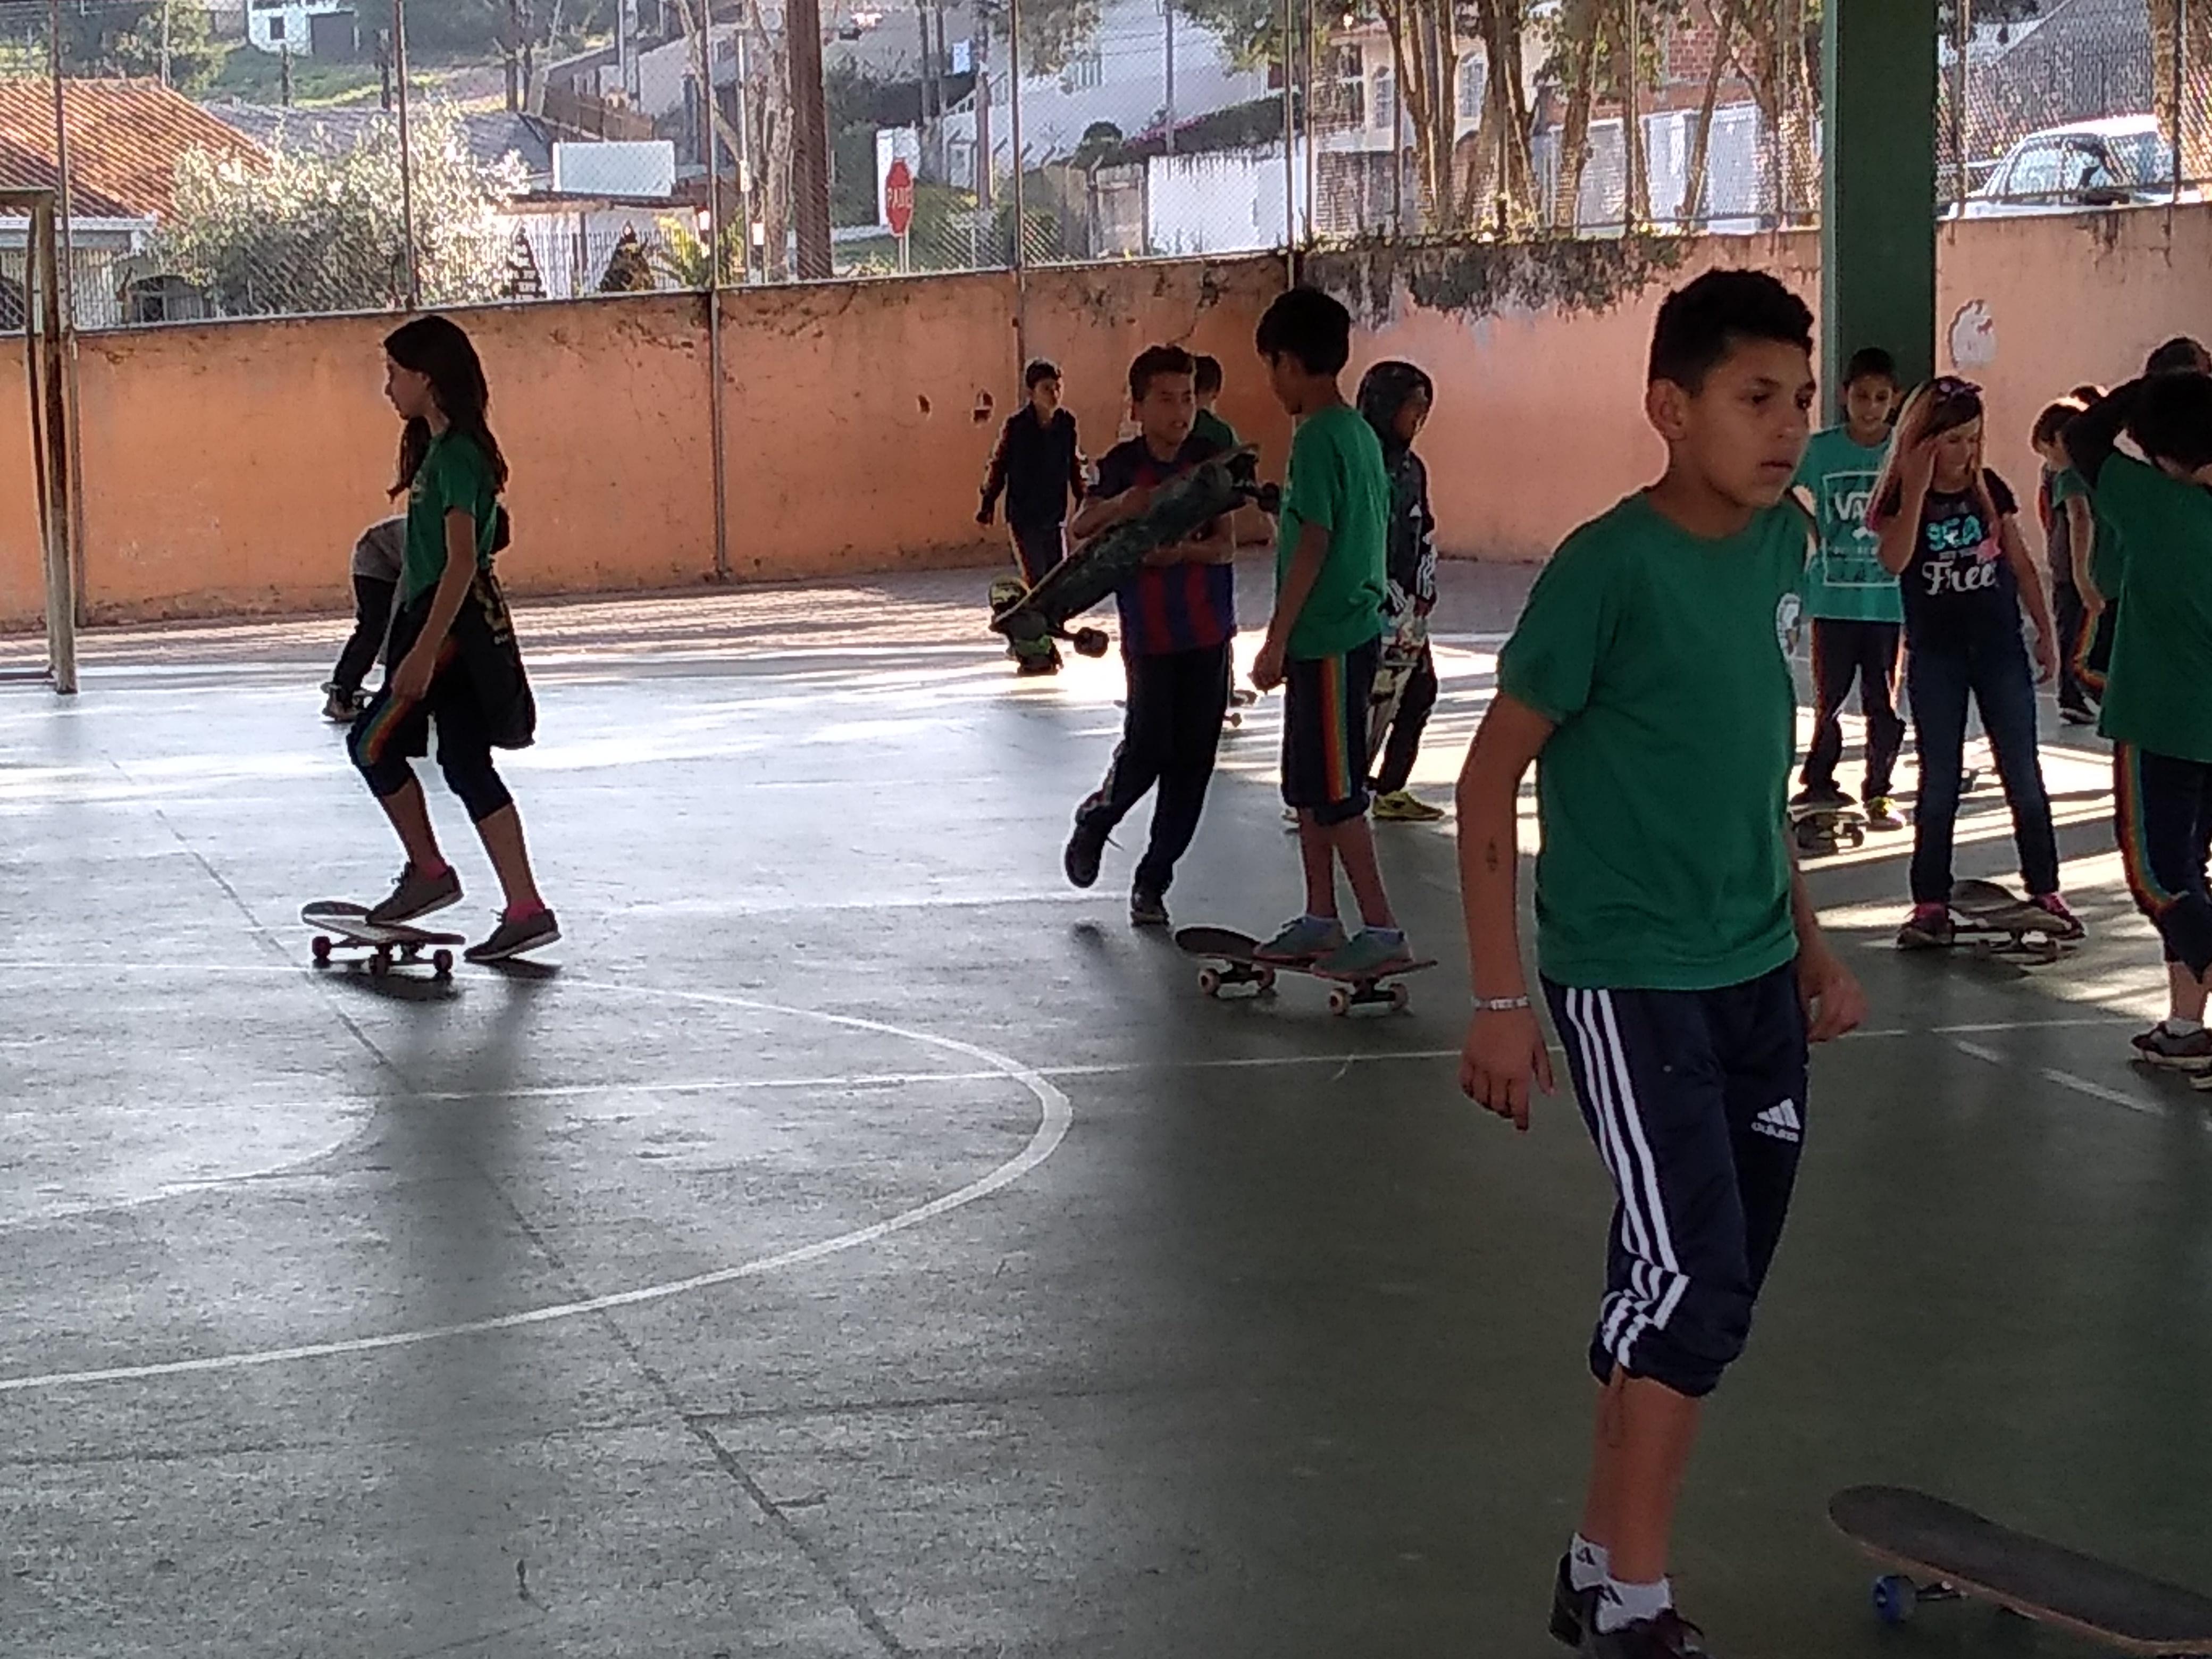 Skate na escola